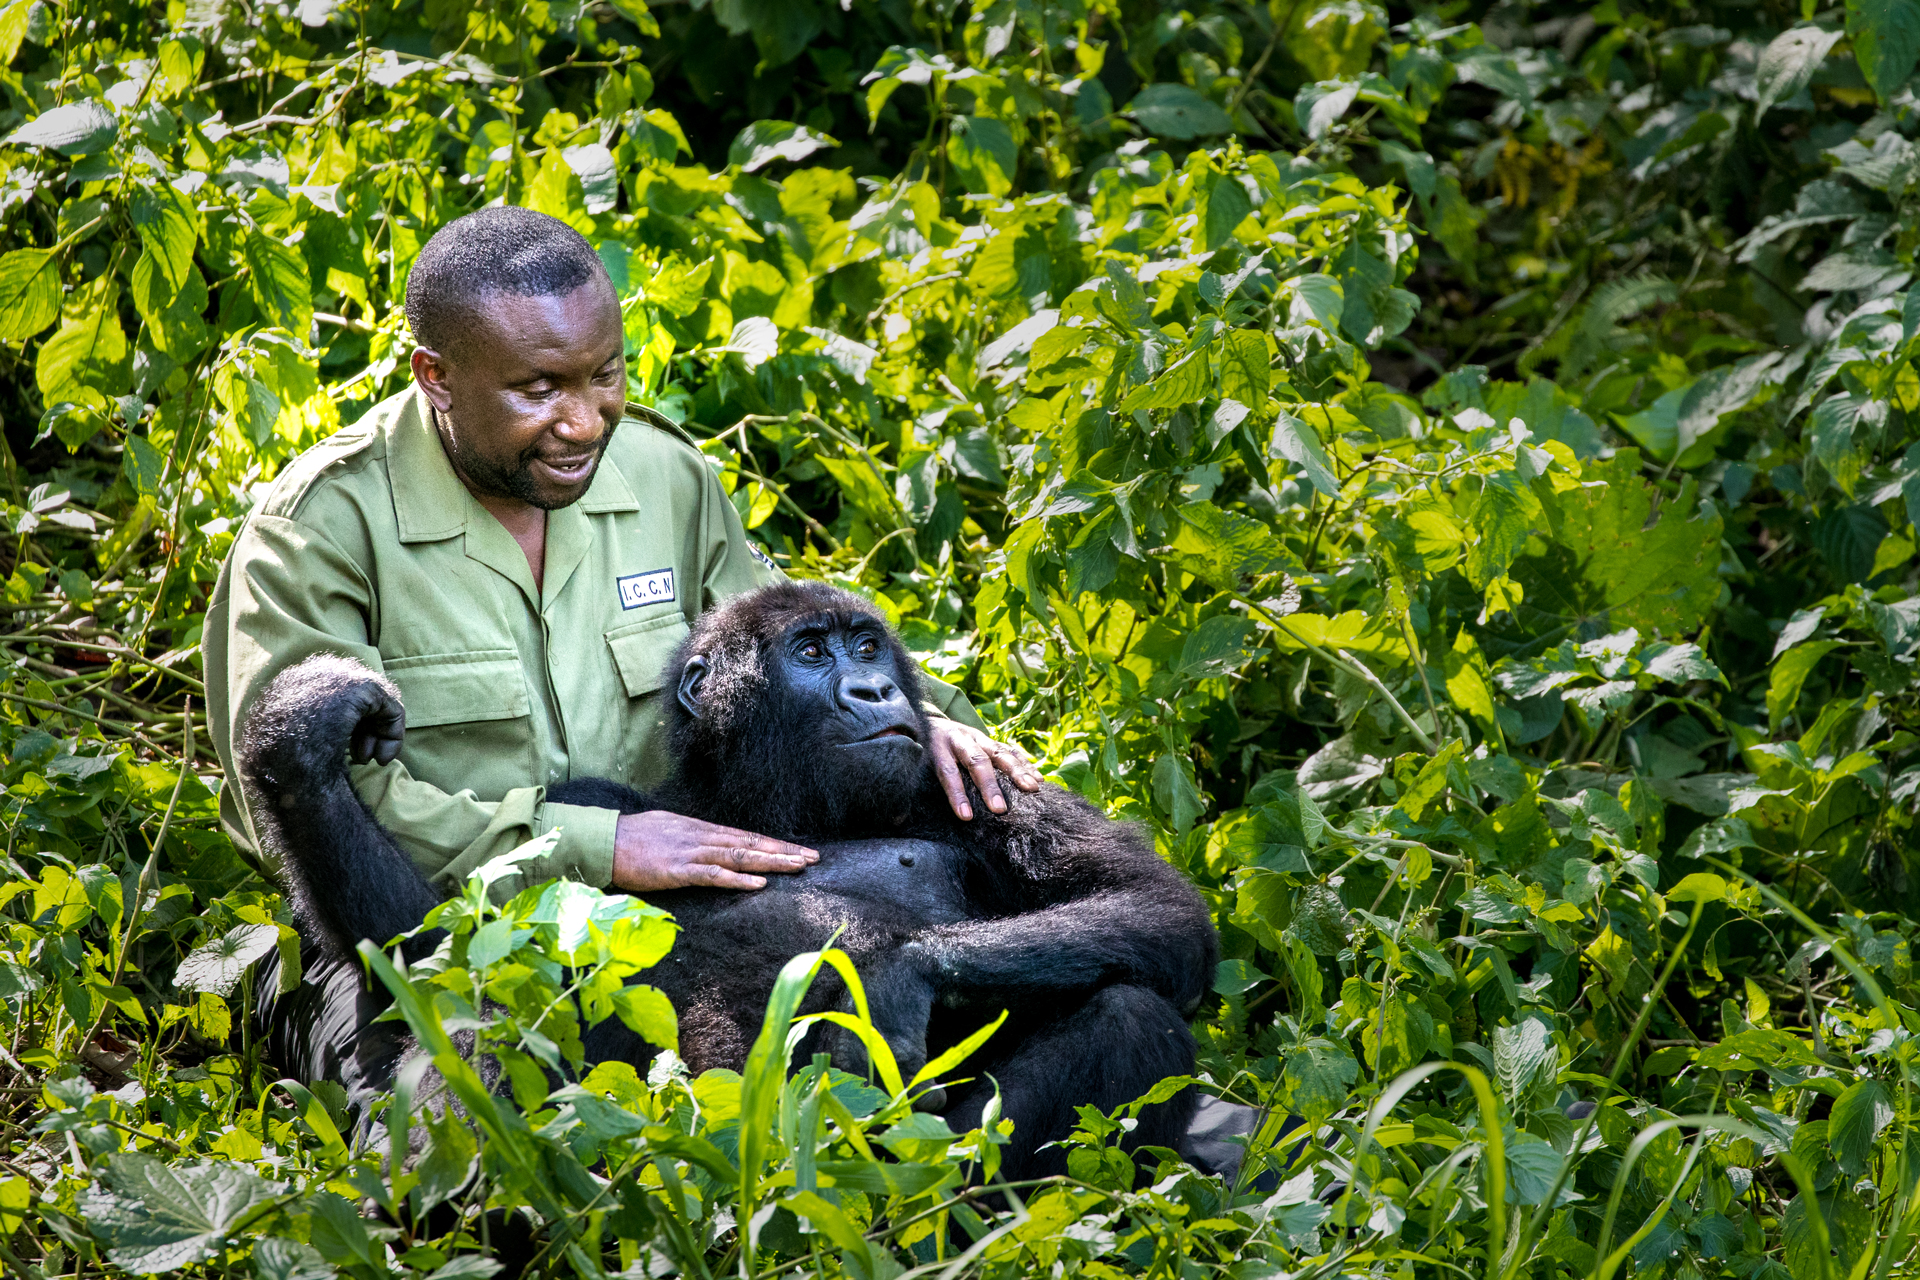 André Bauma, the manager of the Senkwekwe Center, plays with Ndakasi, a Grauer's gorilla